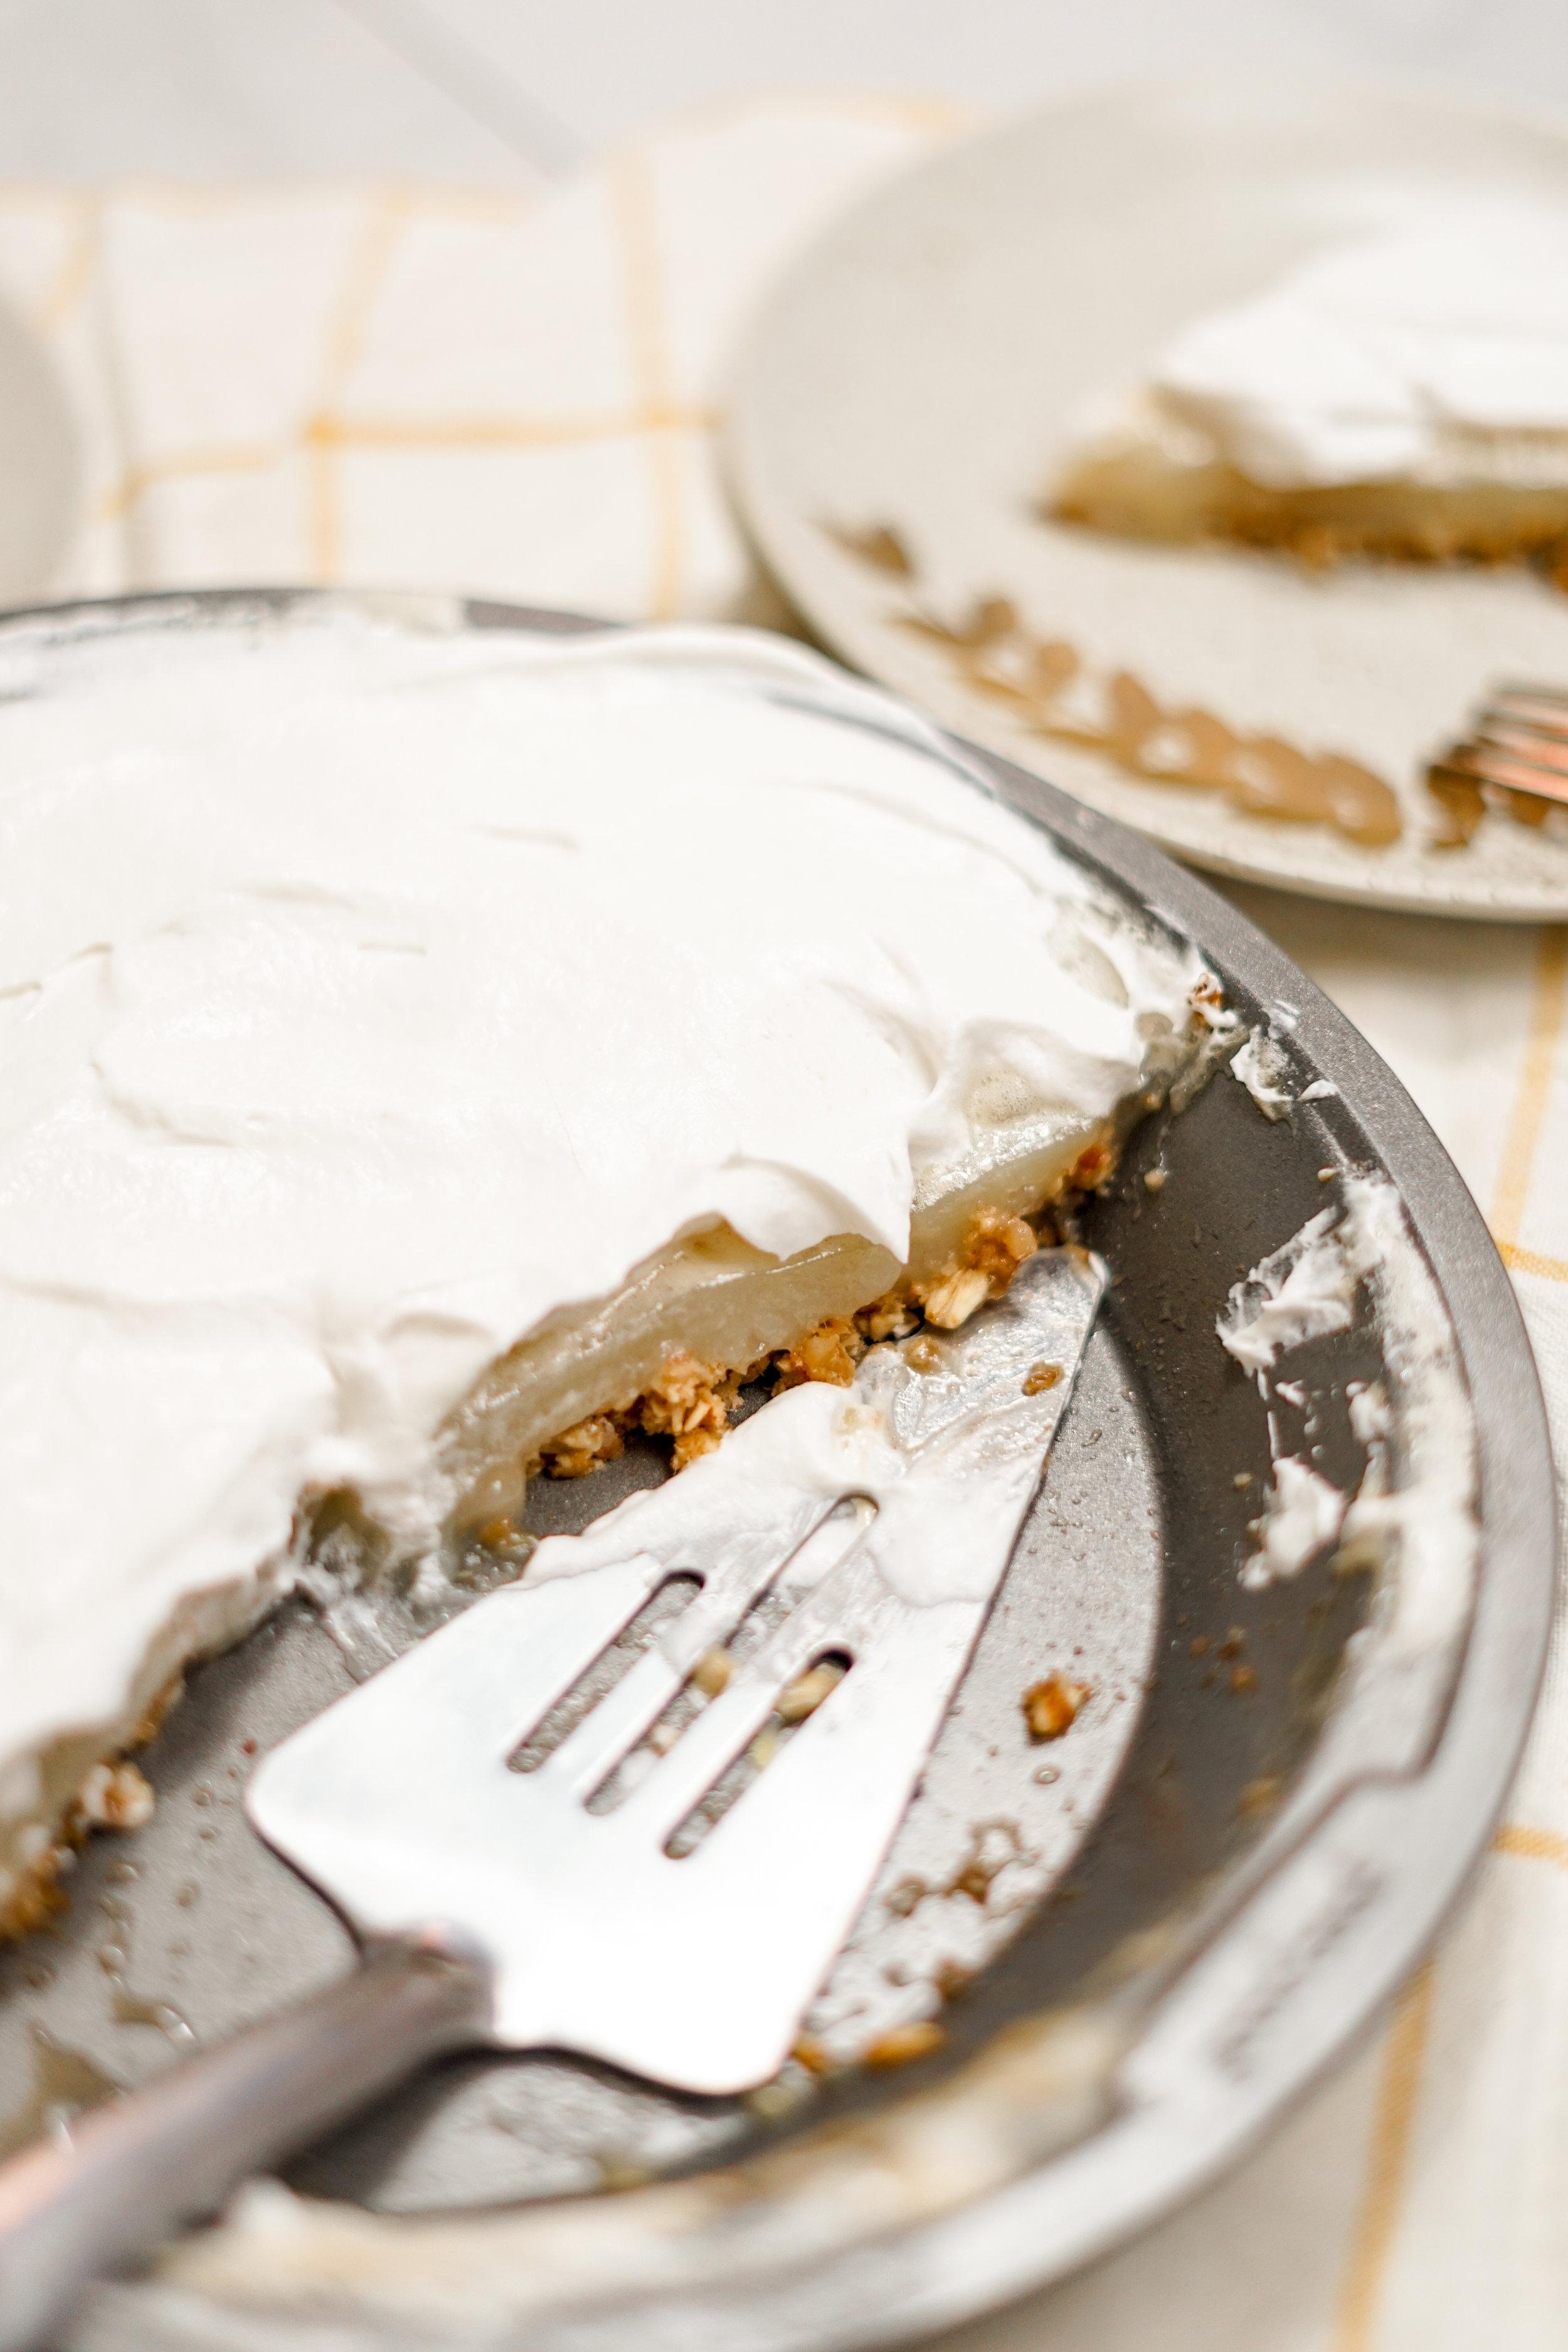 pie, vegan pie, vegan pie recipe, pi day recipe, pie day recipe, vegan pie day recipe, pi day, vegan baking, easy vegan pie recipe, the best lemon merengue pie recipe, the best vegan pie recipe, lemon juice, sugar, coconut whipped cream, how to make a vegan pie, recipes for vegan pie, recipe for vegan lemon merengue pie, cream pie recipes, vegan cream pie recipes, i am rorie, i am rorie pie recipe, i am rorie recipes, i am rorie baking recipe, whole foods, chicago food blogger, vegan chicago food blogger, i am rorie vegan food blogger, food bloggers from chicago, pie day recipes, sweets using lemons, how to use lemon juice in baking, baked goods, vegan baked goods